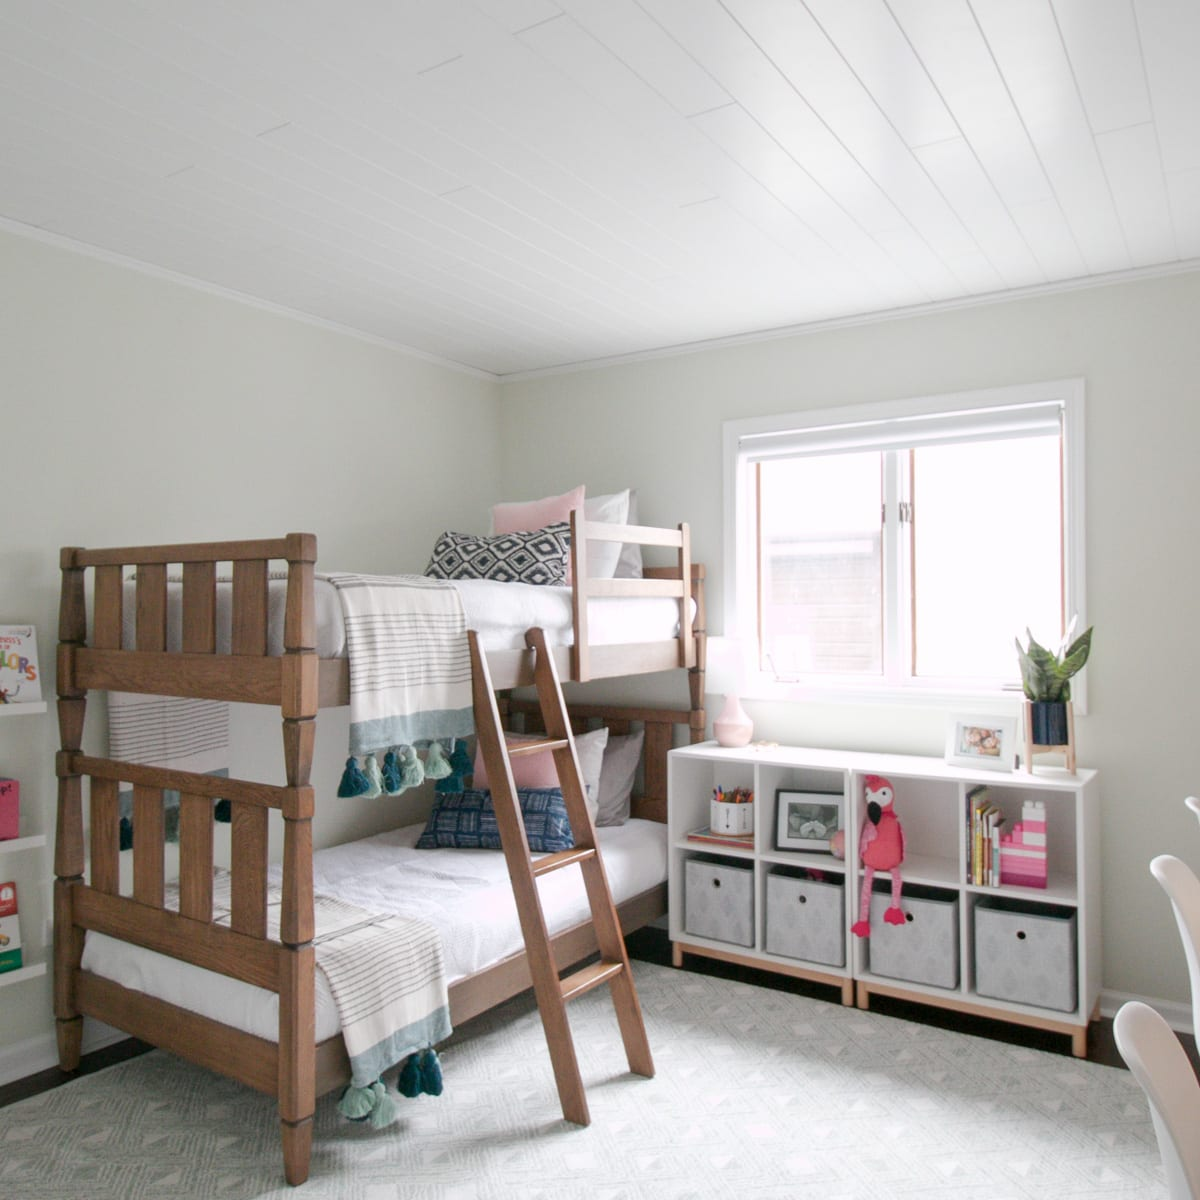 Armstrong ceilings beadboard in the bedroom